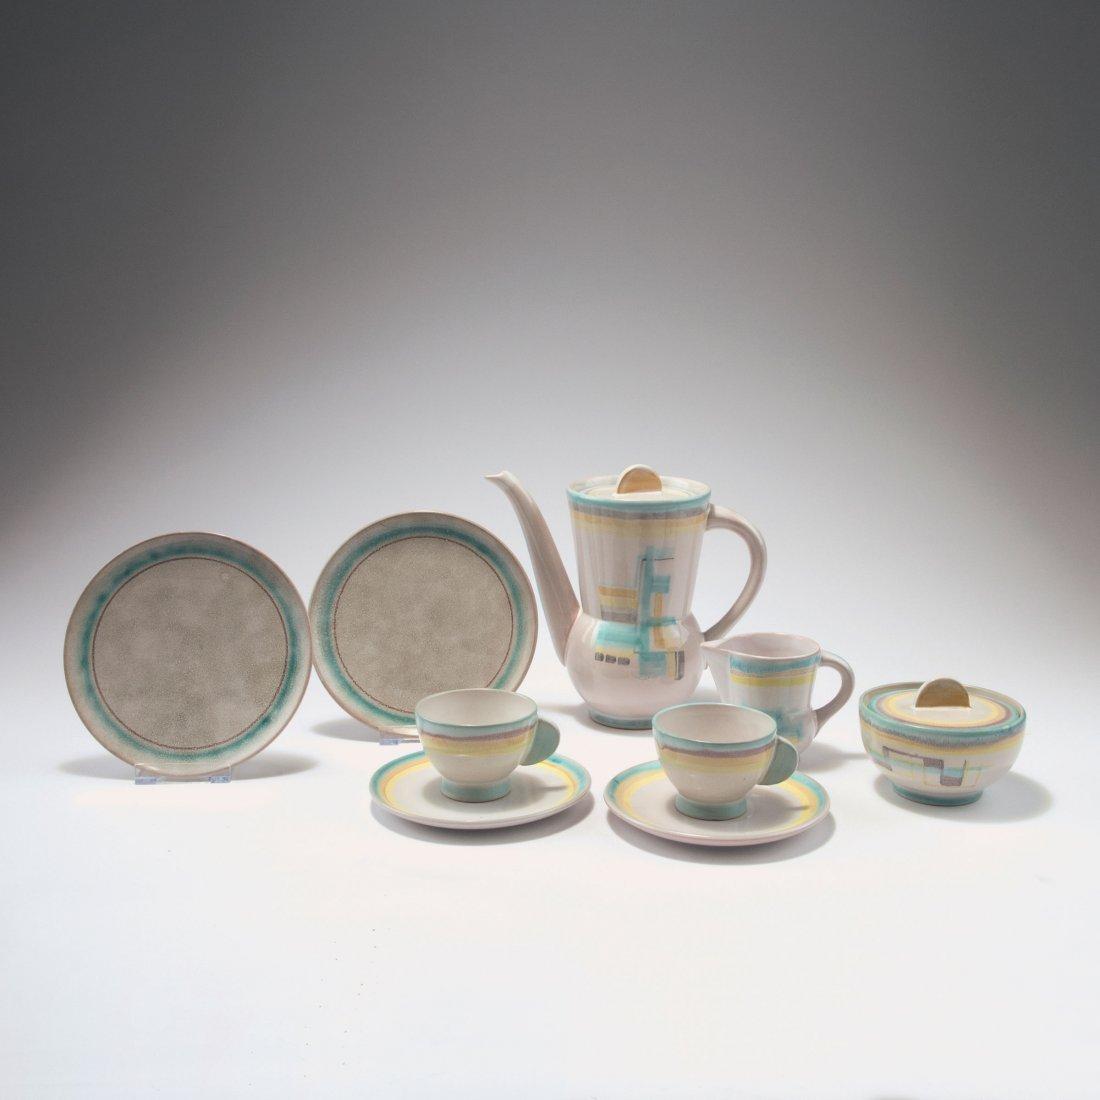 'Cologne' coffee set, c1928